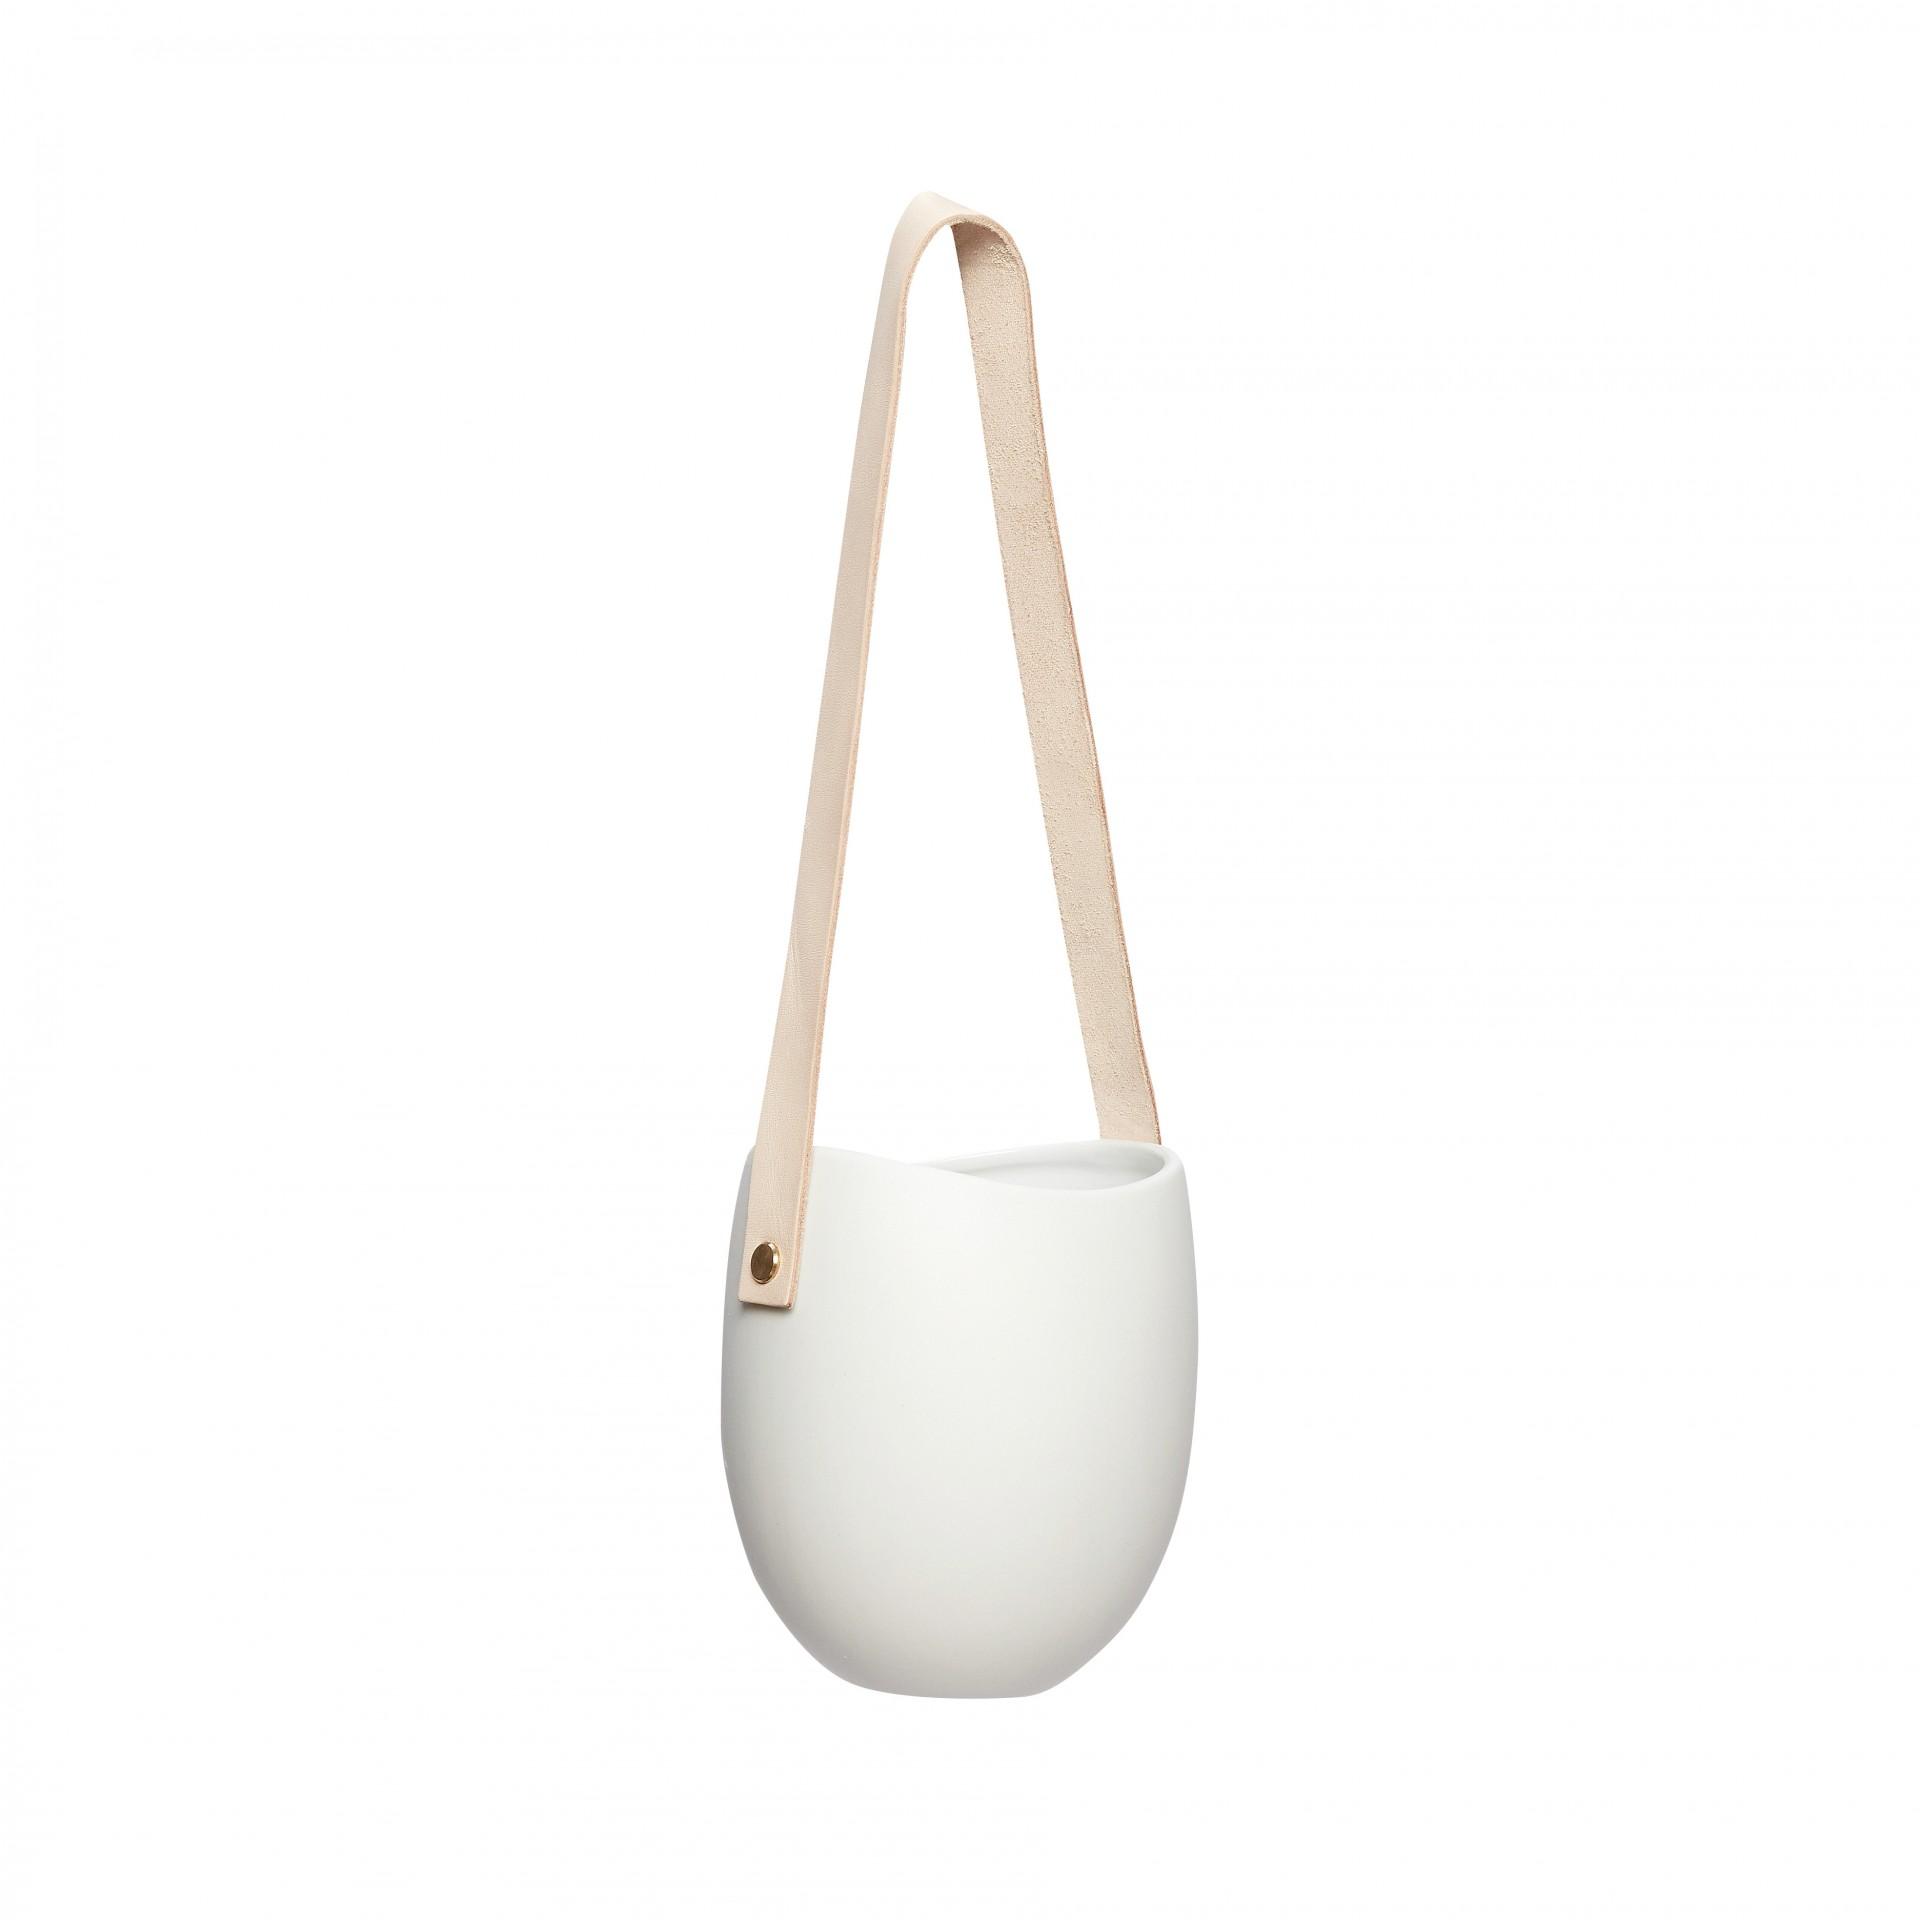 Vaso p/suspender, cerâmica, Ø12x15 cm